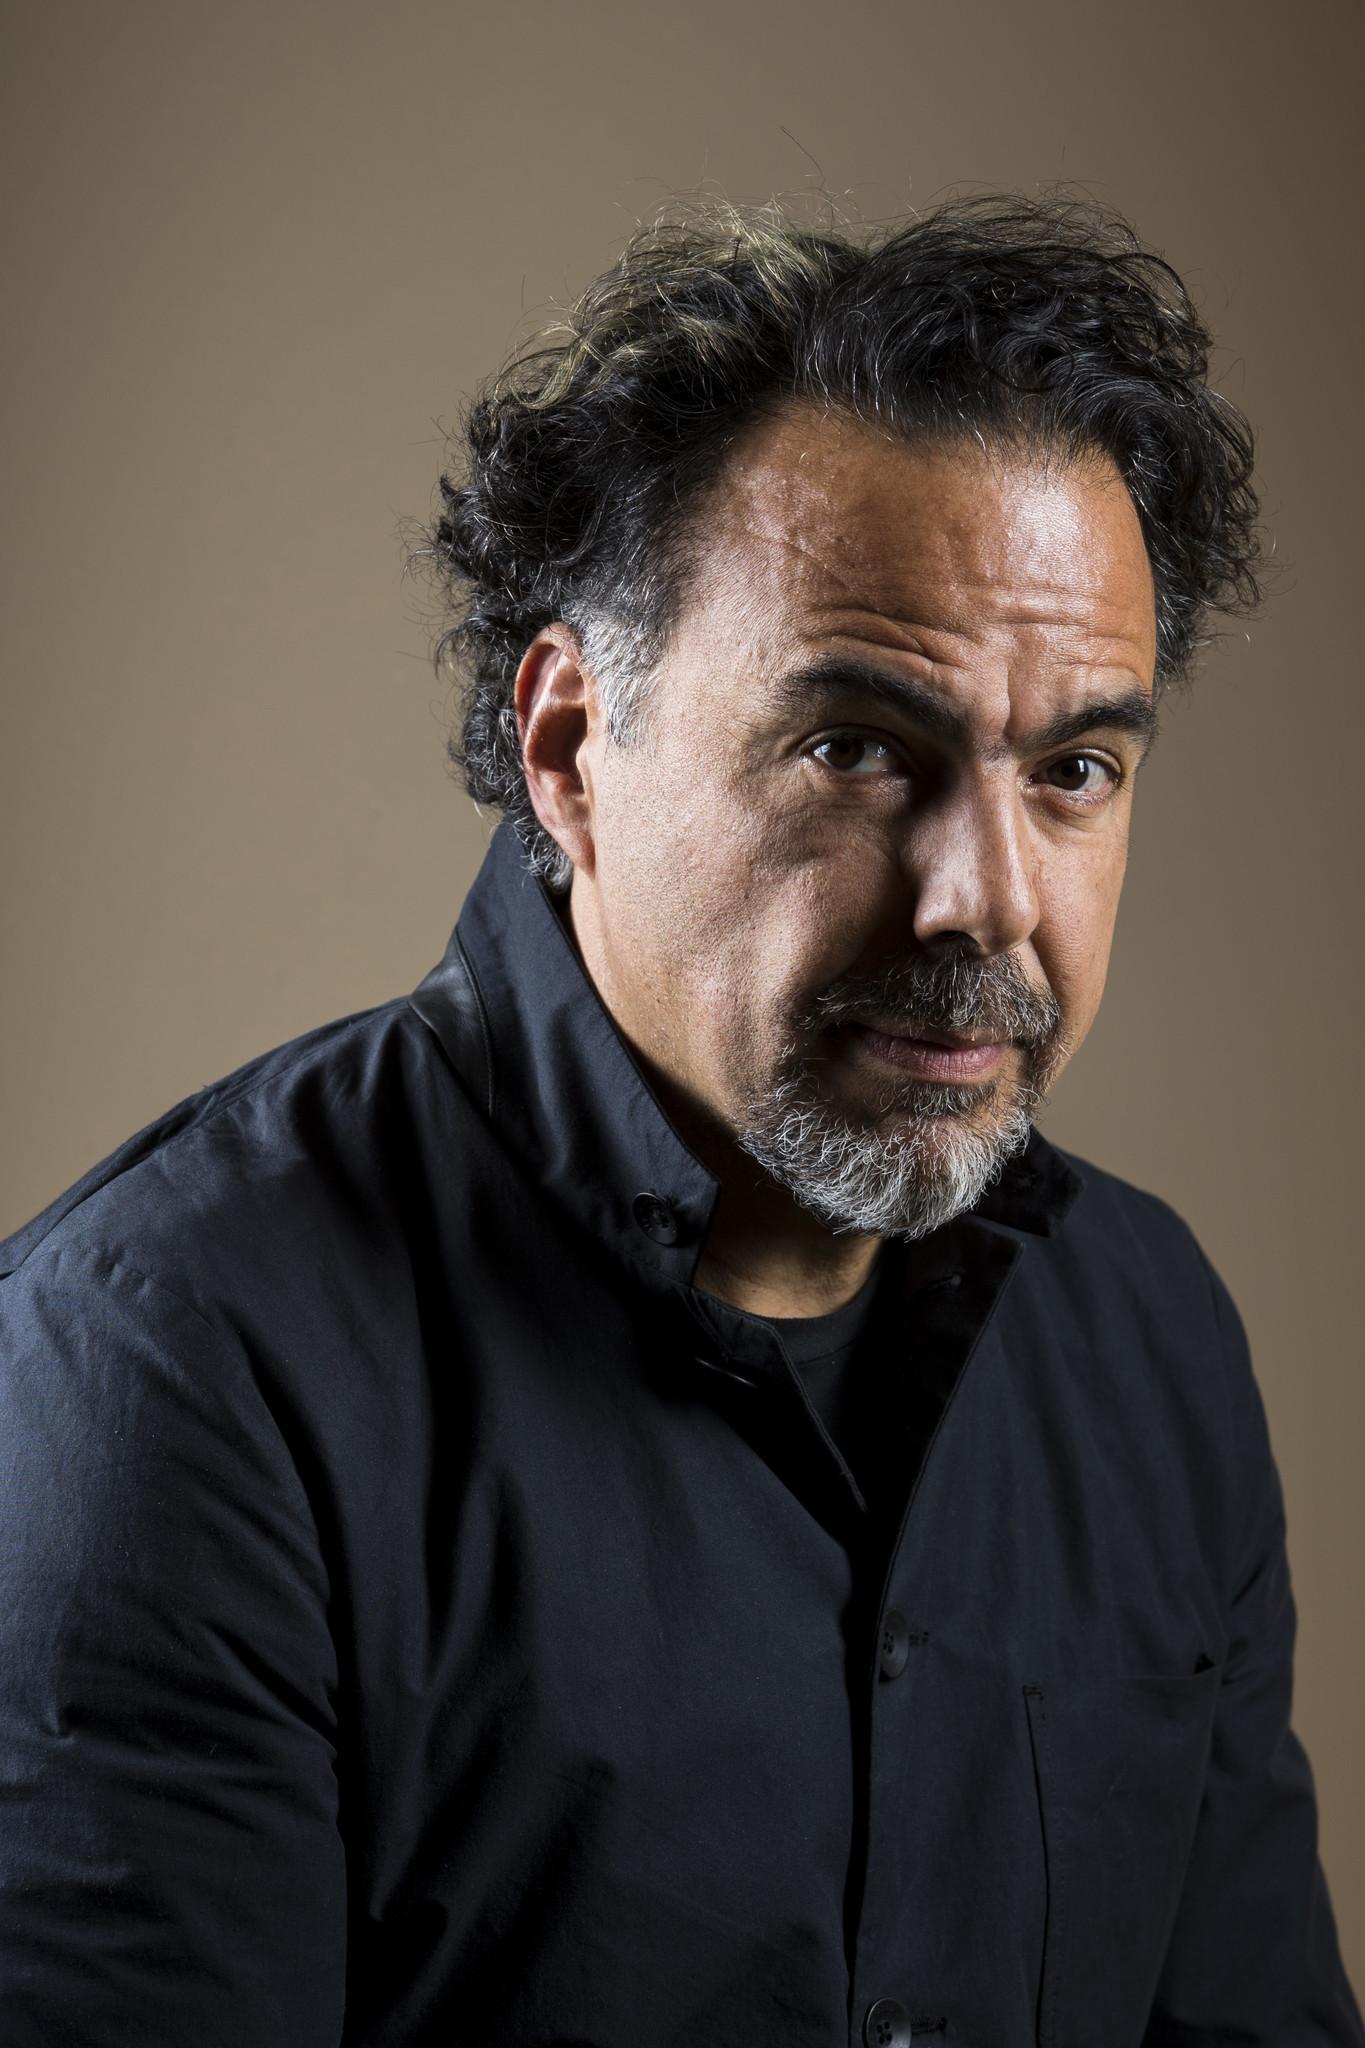 LOS ANGELES, CA - NOVEMBER 20: Academy Award-winning Director Alejandro Inarritu poses for a portrai